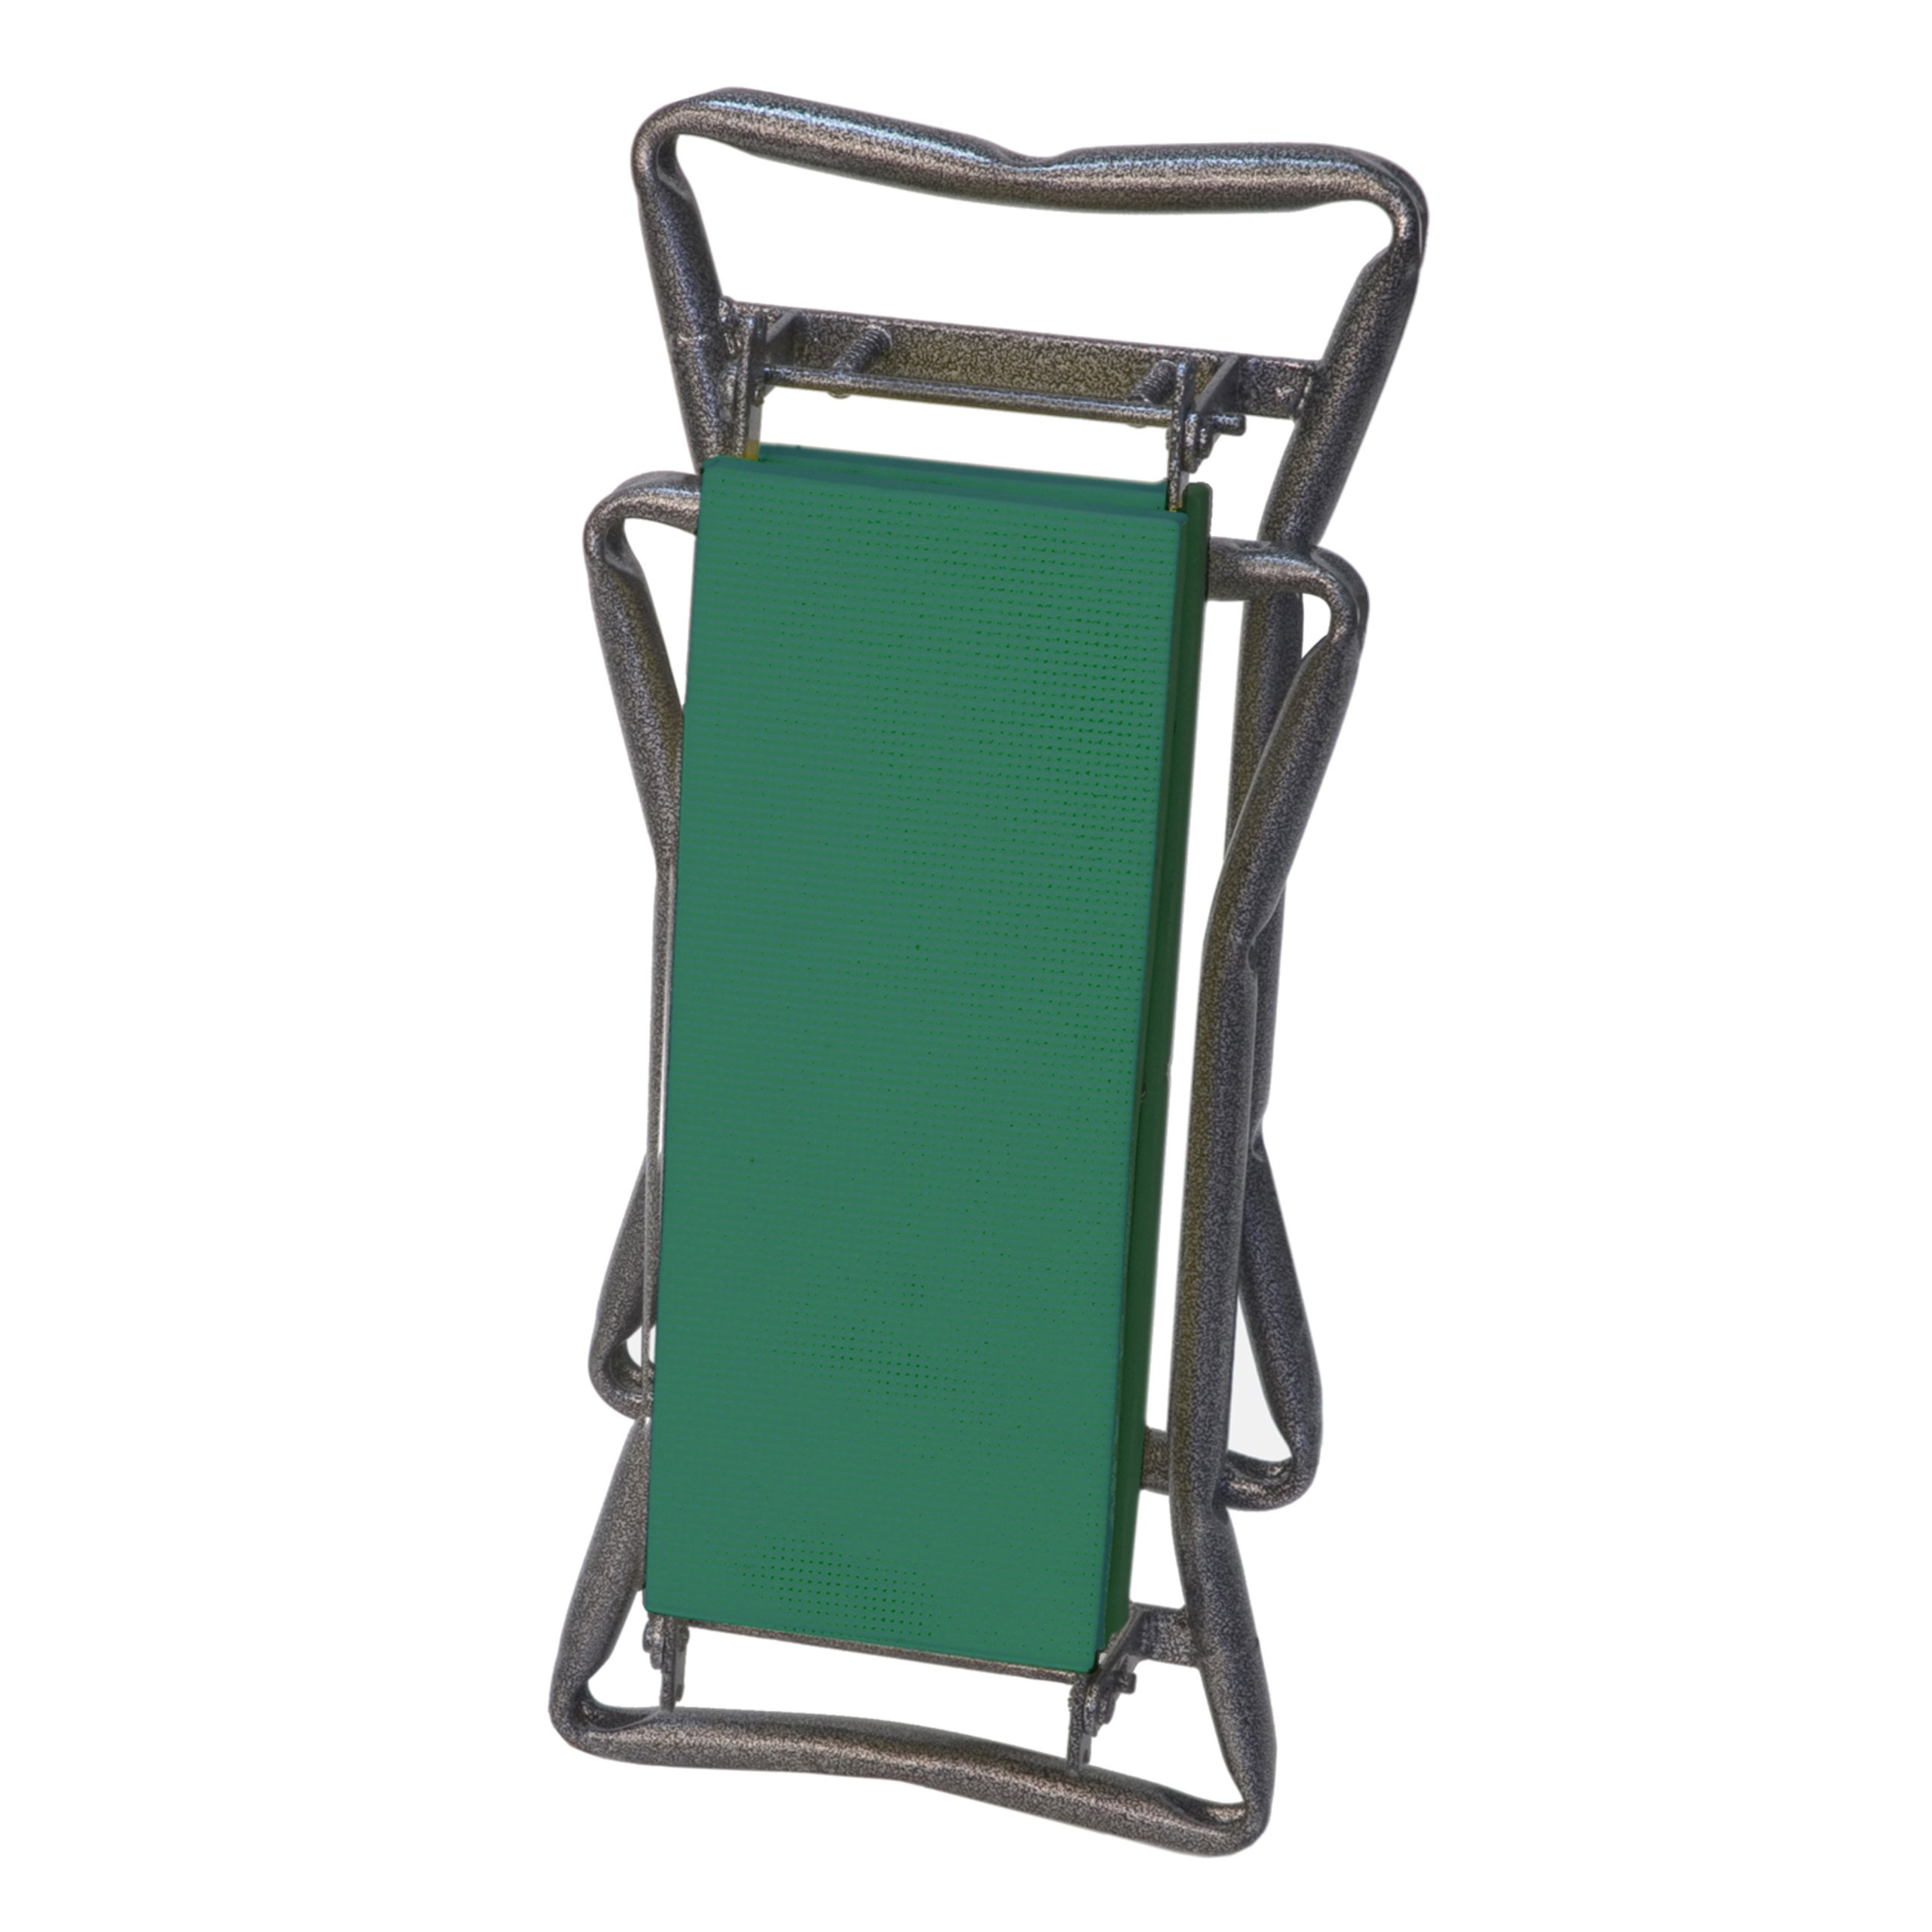 Astonishing Cheap Crocs Kneeler Find Crocs Kneeler Deals On Line At Machost Co Dining Chair Design Ideas Machostcouk